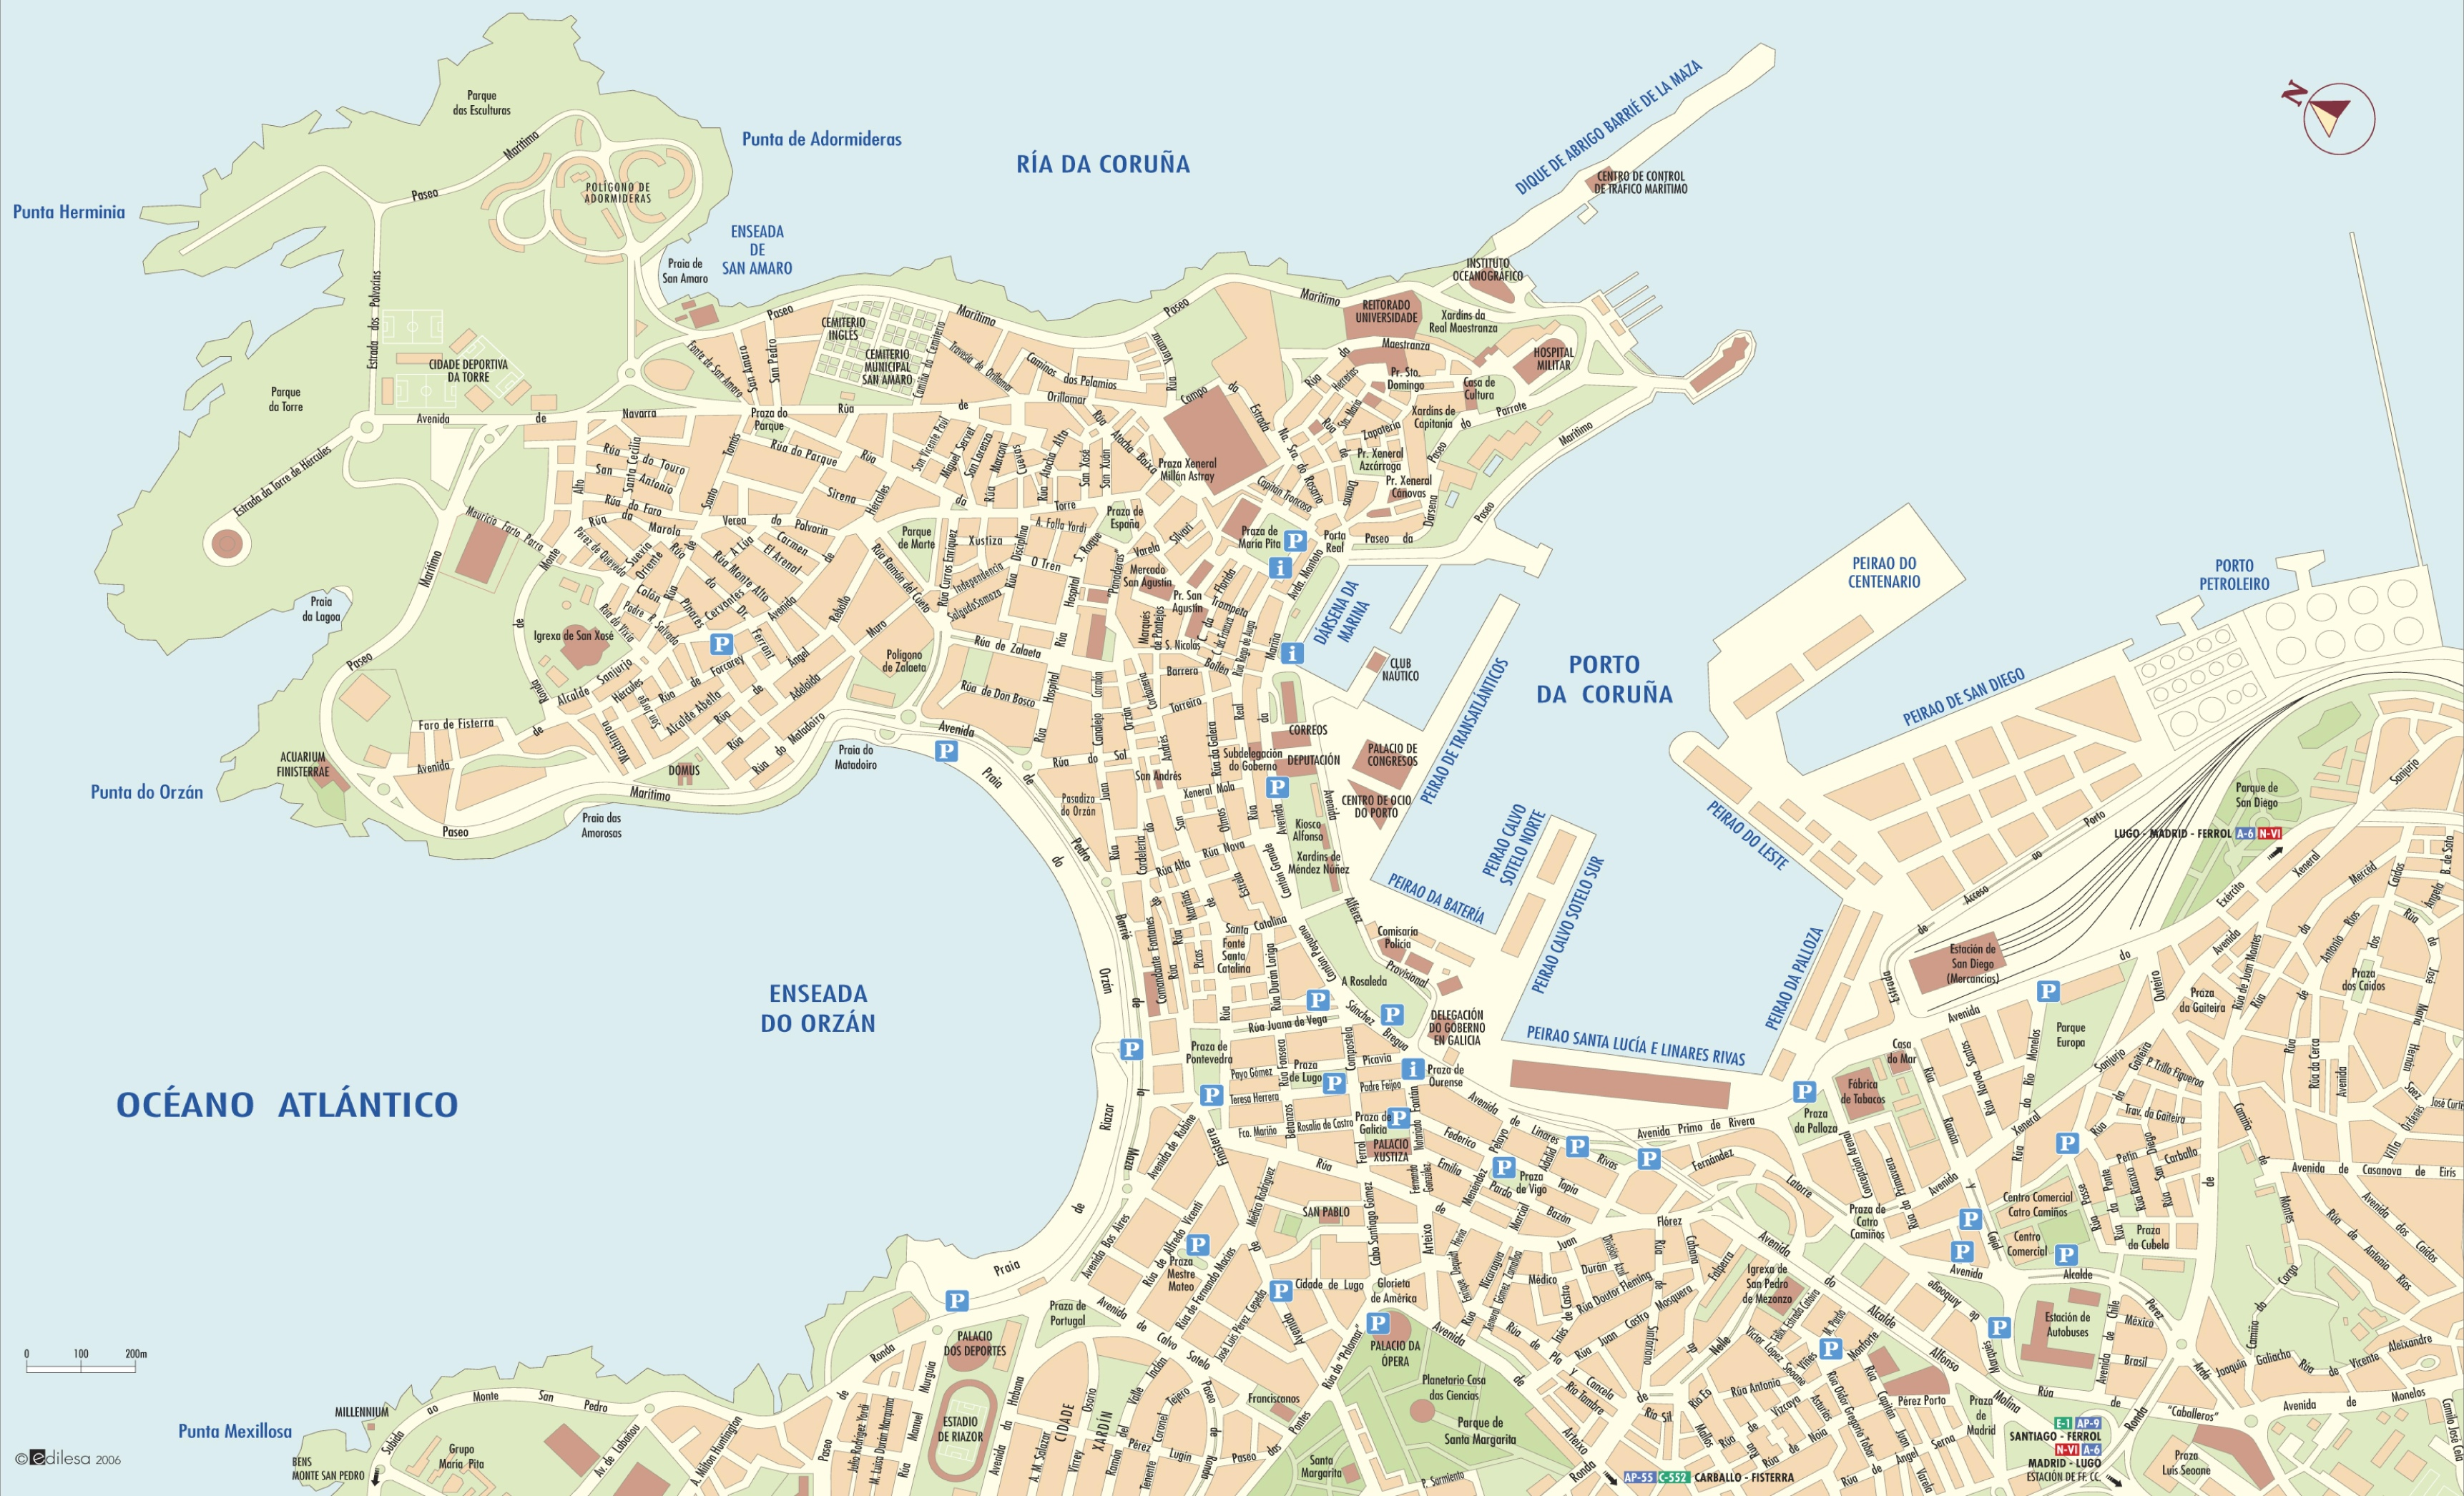 Map Of Spain La Coruna.A Coruna City Center Map